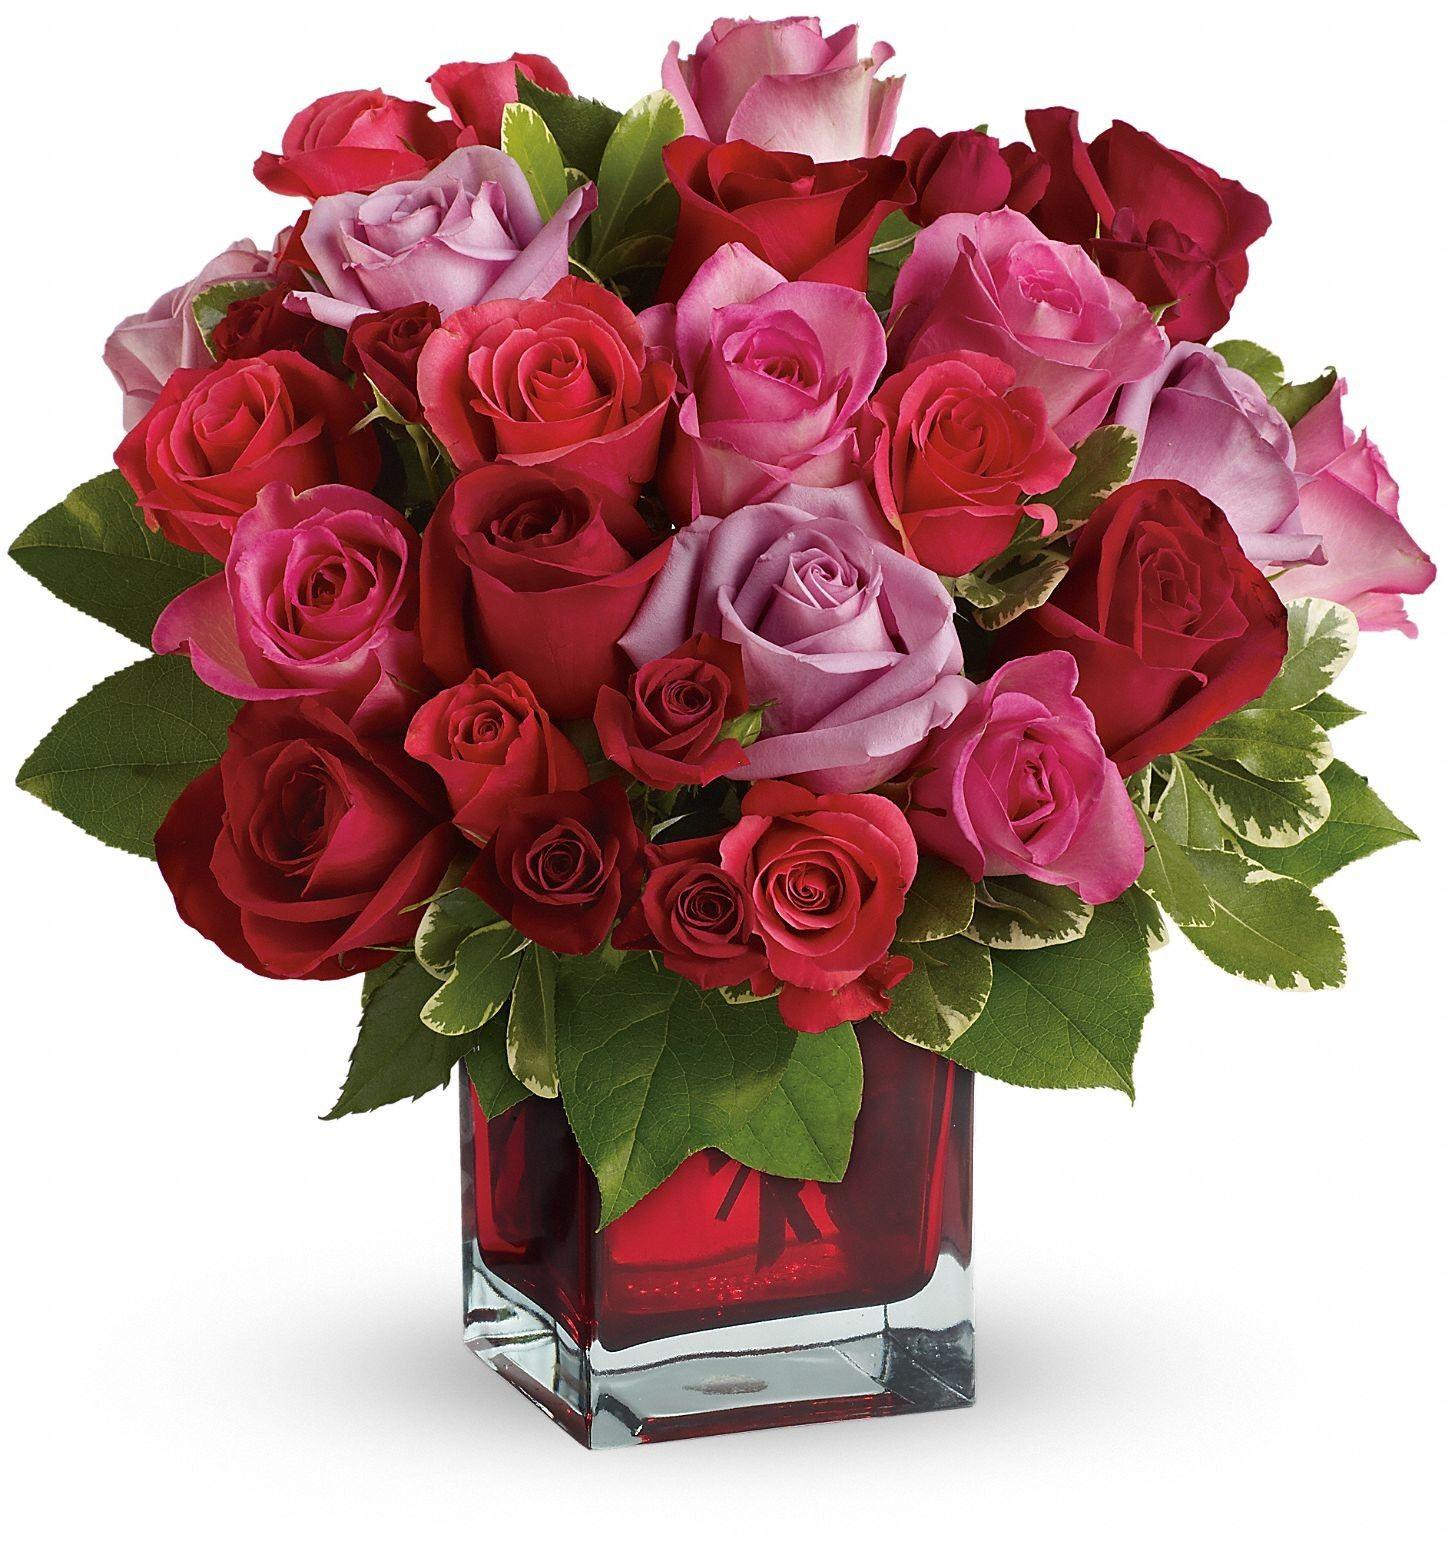 Happy Birthday Bouquet Flowers Wonderful Wedding Bouquets Valentines Flowers Flower Delivery Anniversary Flowers